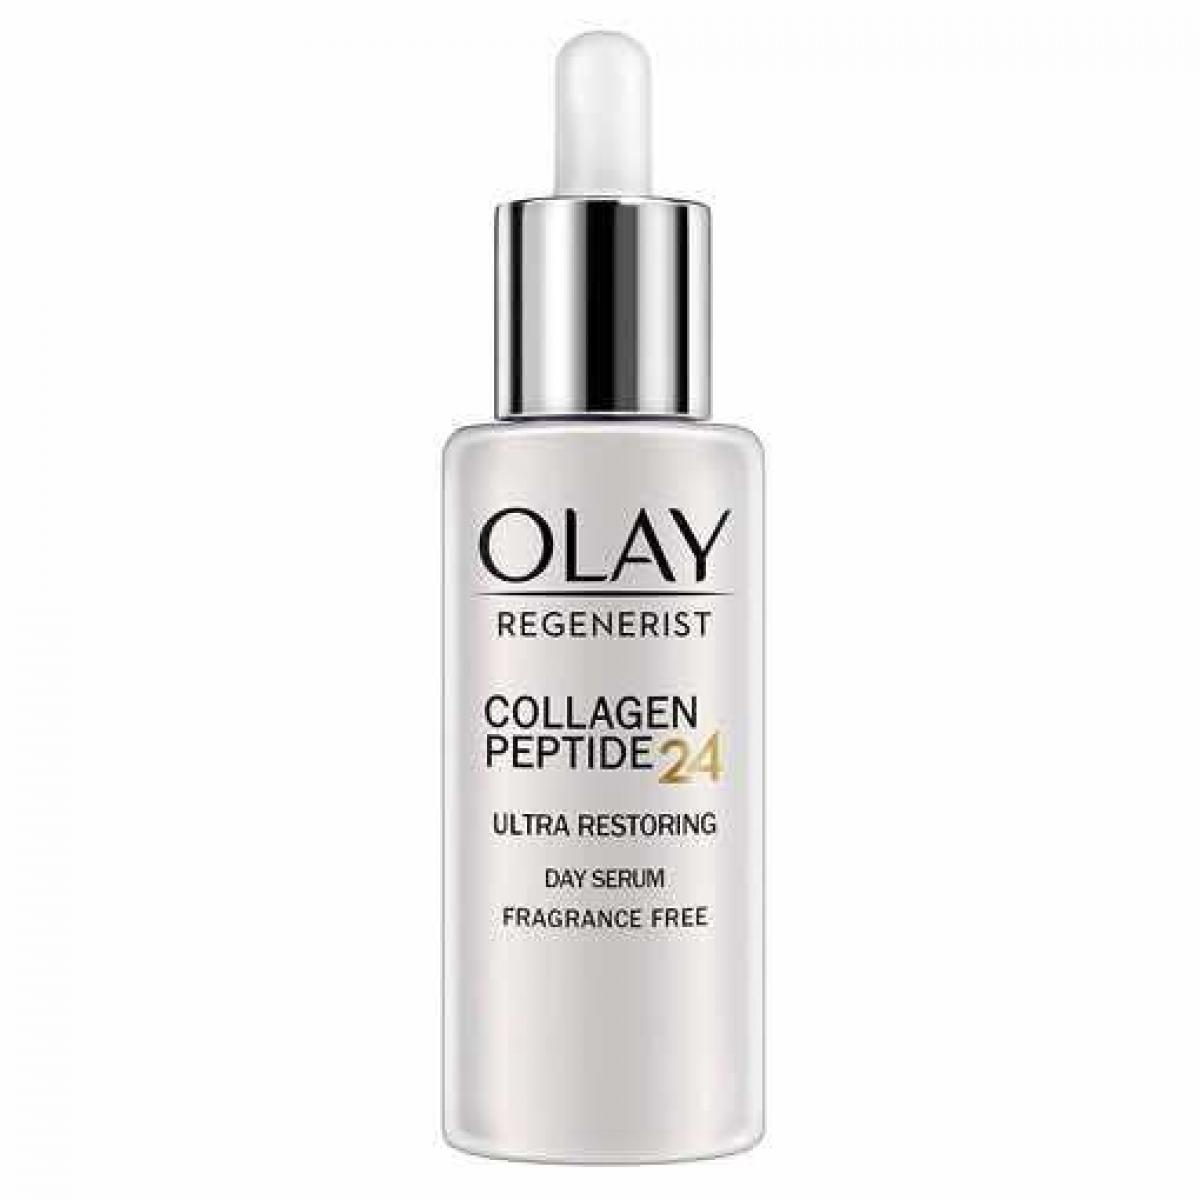 OLAY Regenerist Collagen Peptide 24 Ultra Restoring Day Serum Fragrance Free